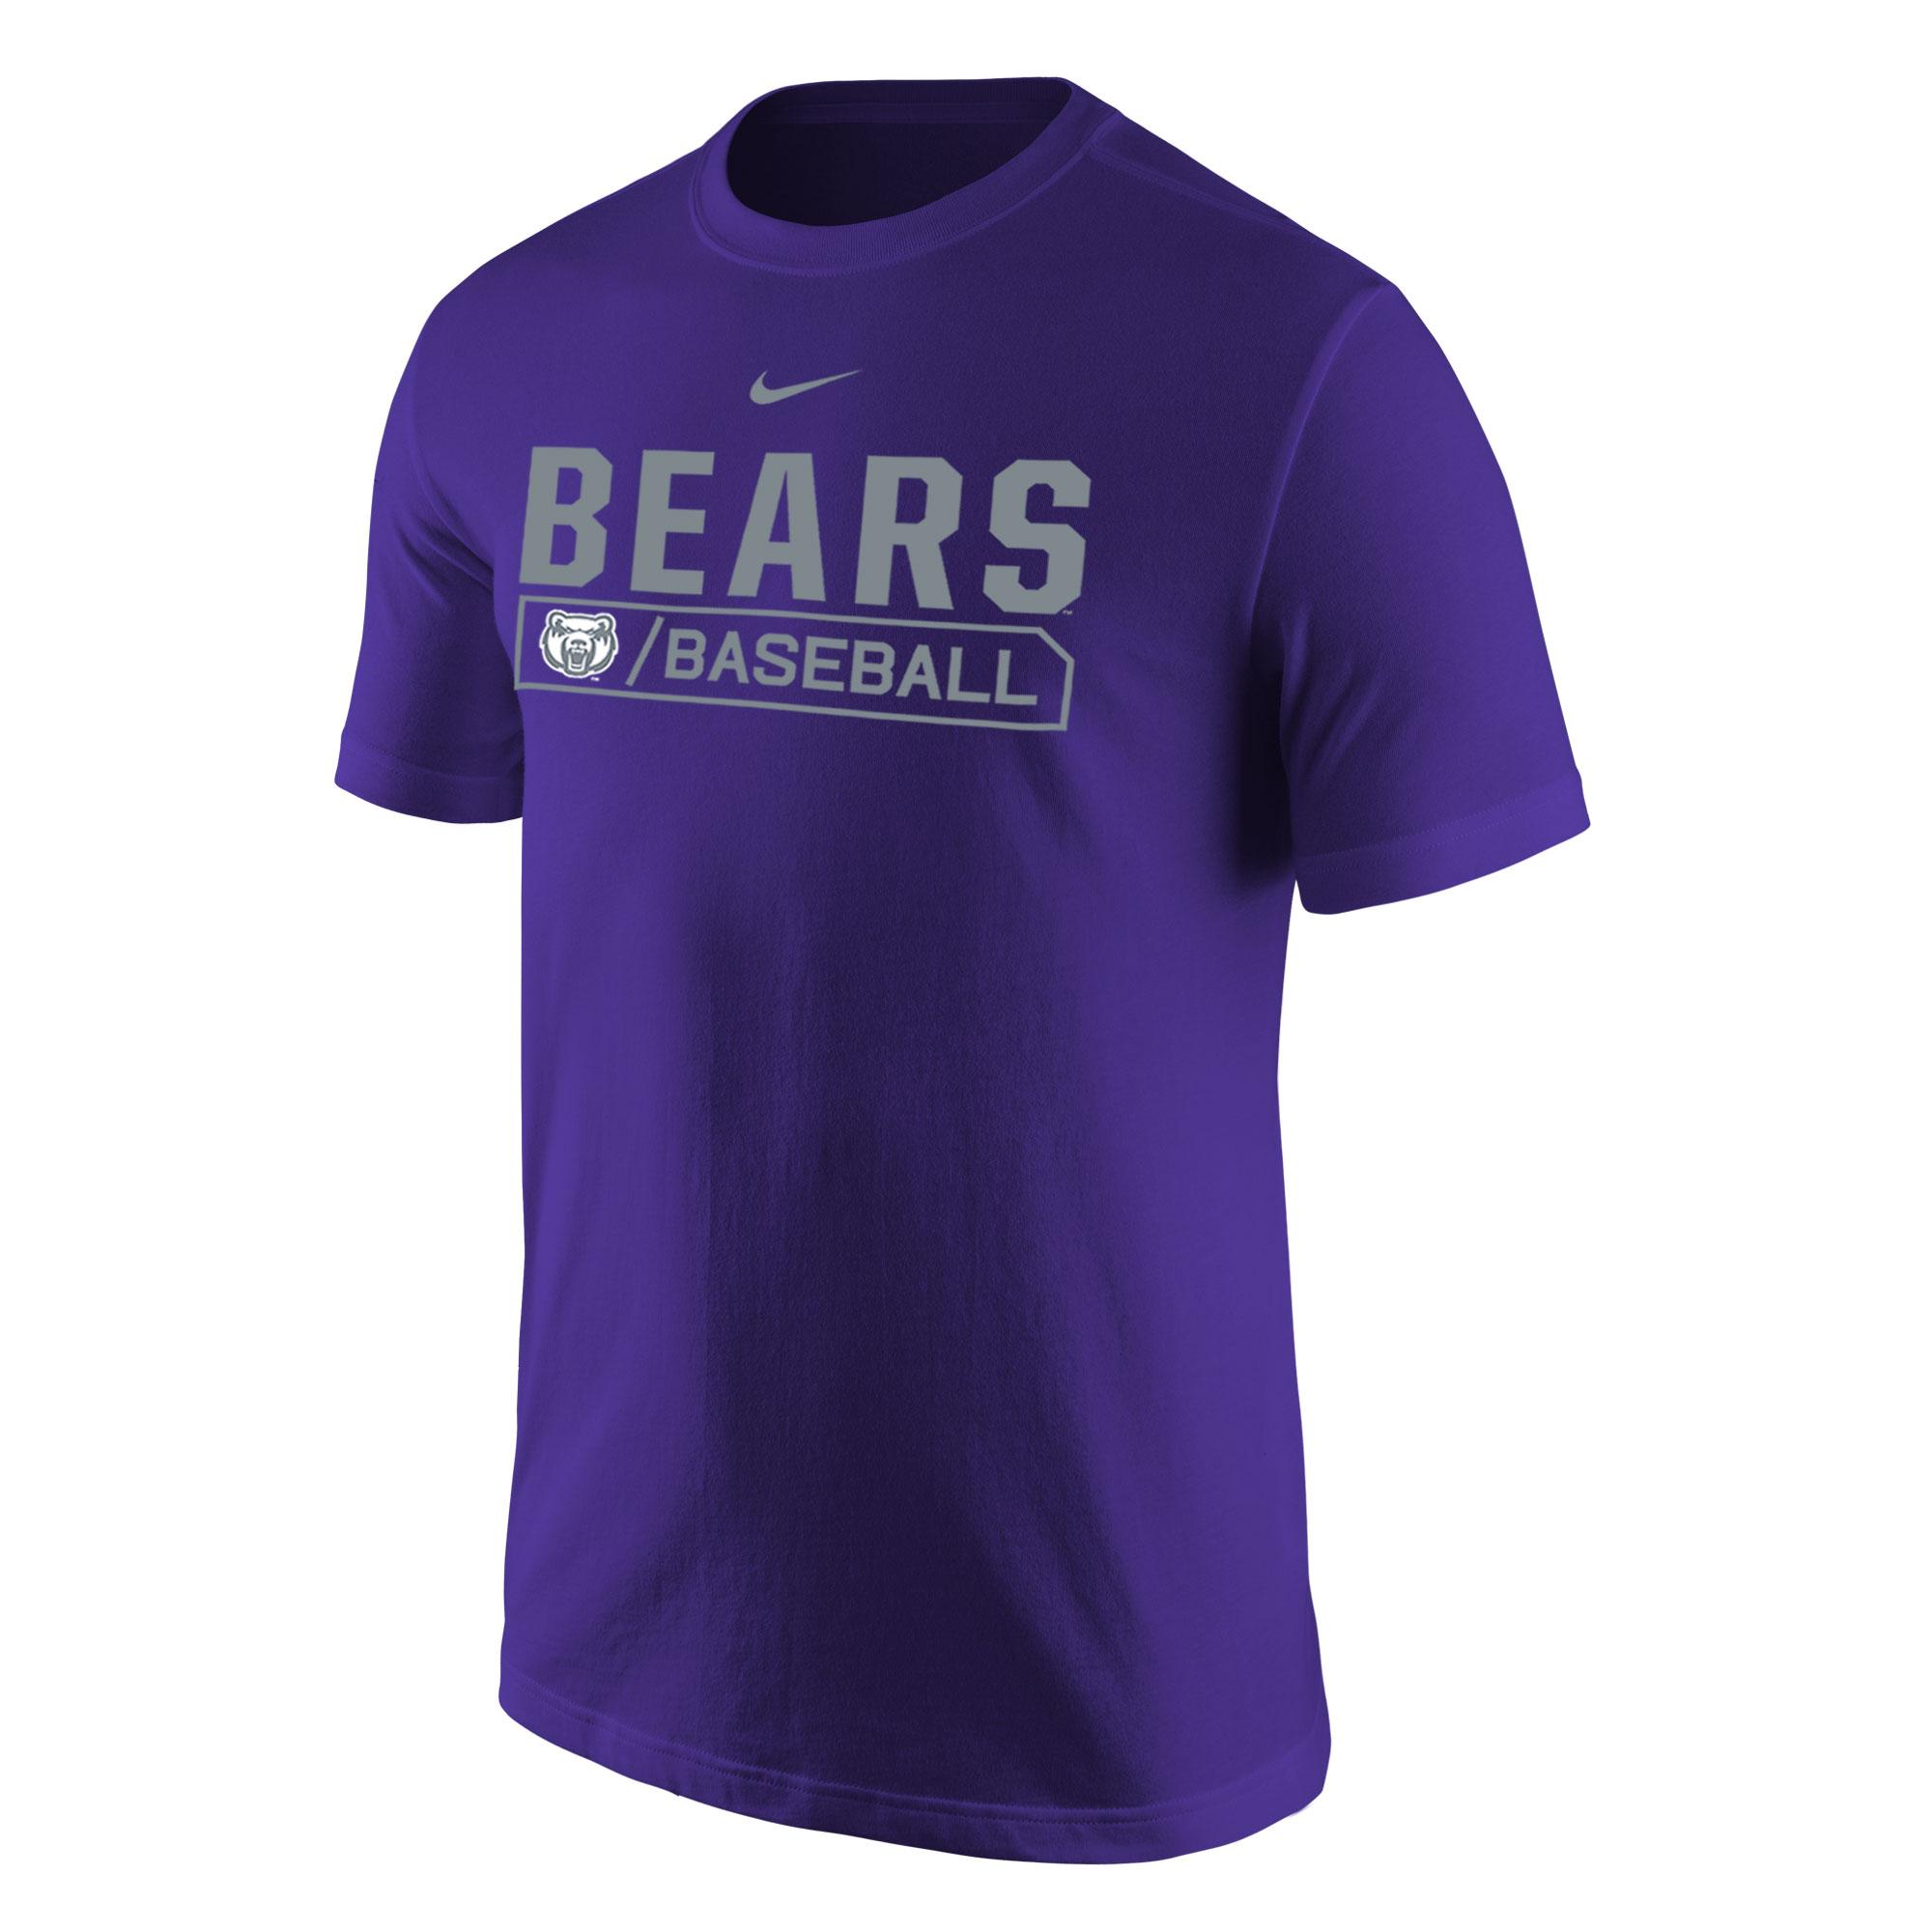 Bears Baseball Tee